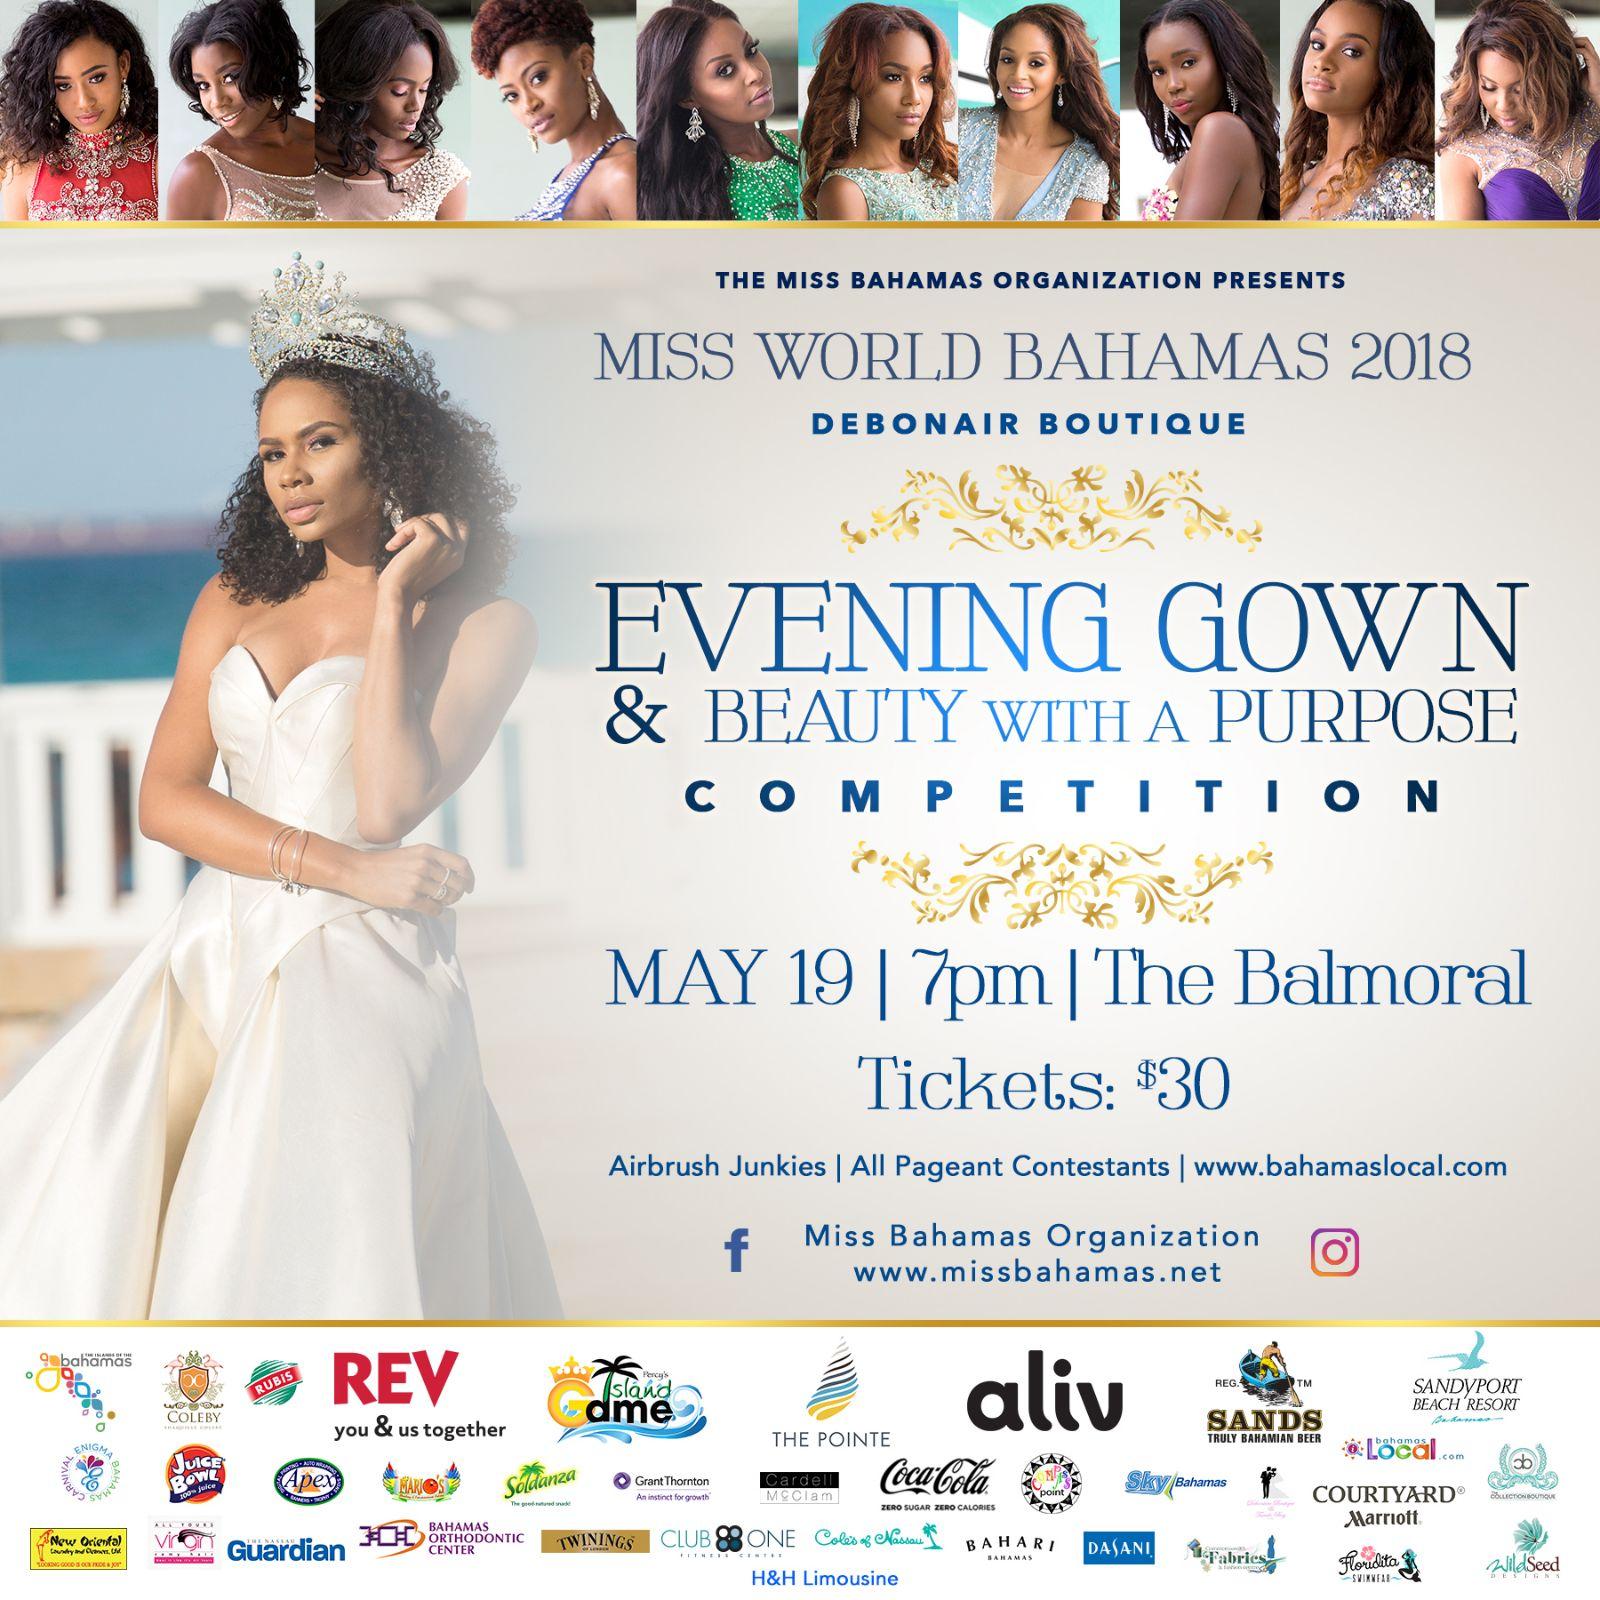 Evening Gown flyer.jpg